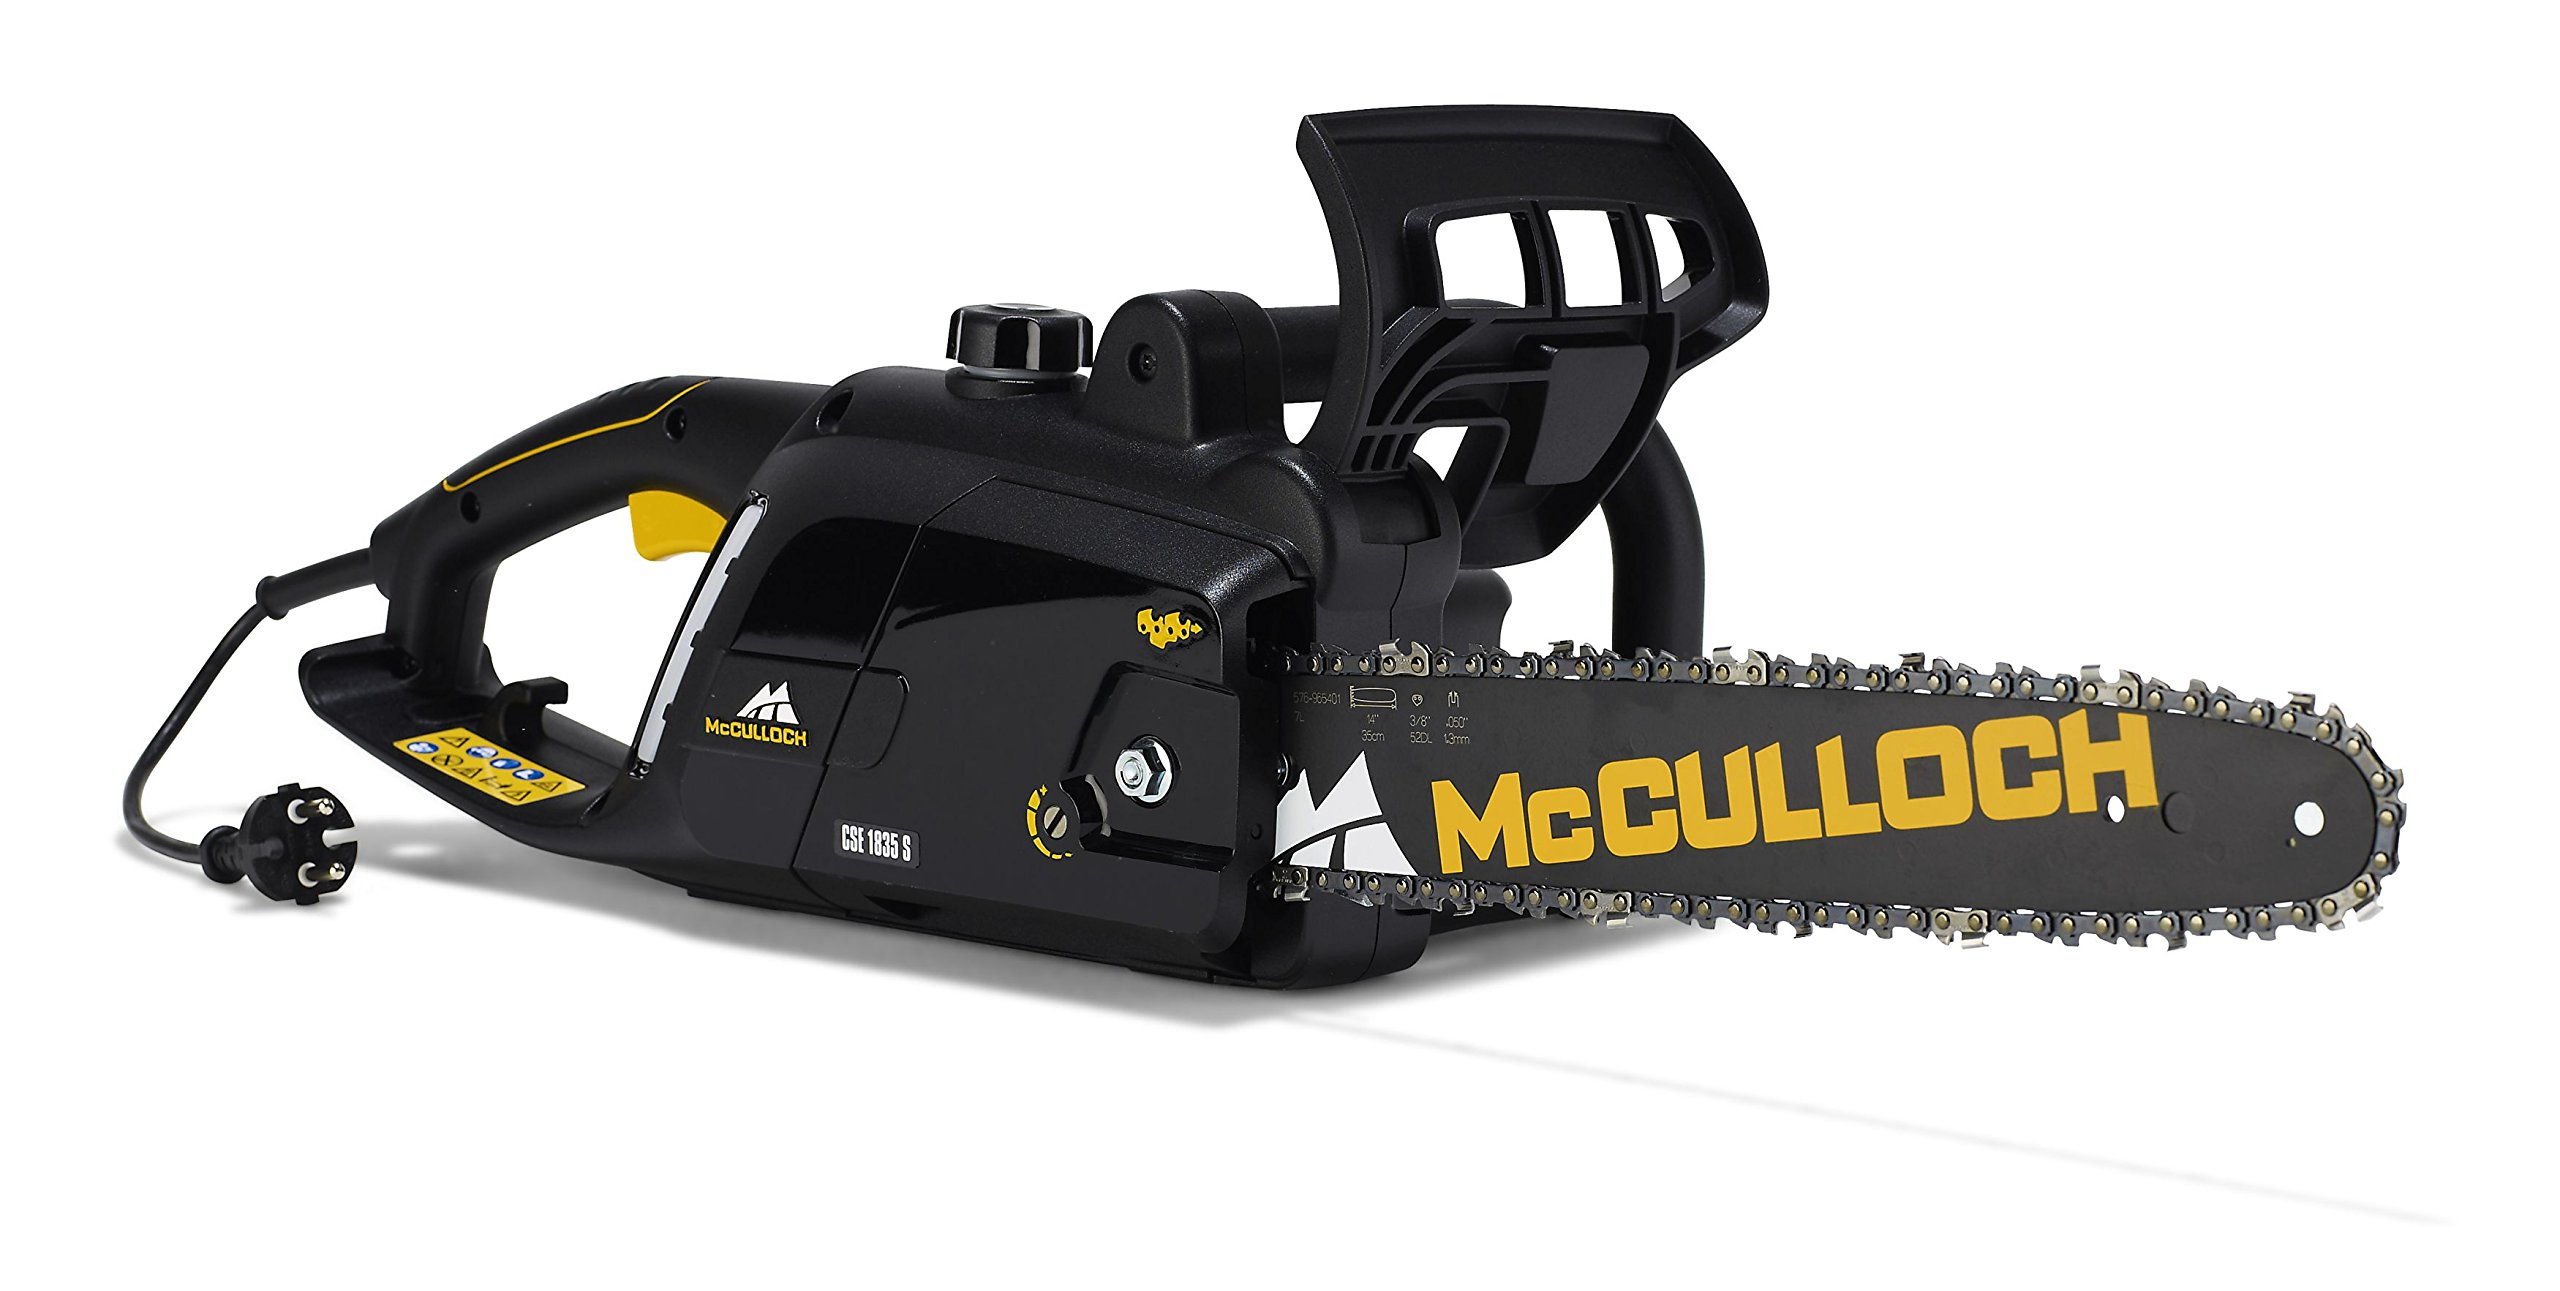 McCulloch-00096-7147901-Kettensge-Elektro-CSE1835-1800-W-Schwarz-Gelb